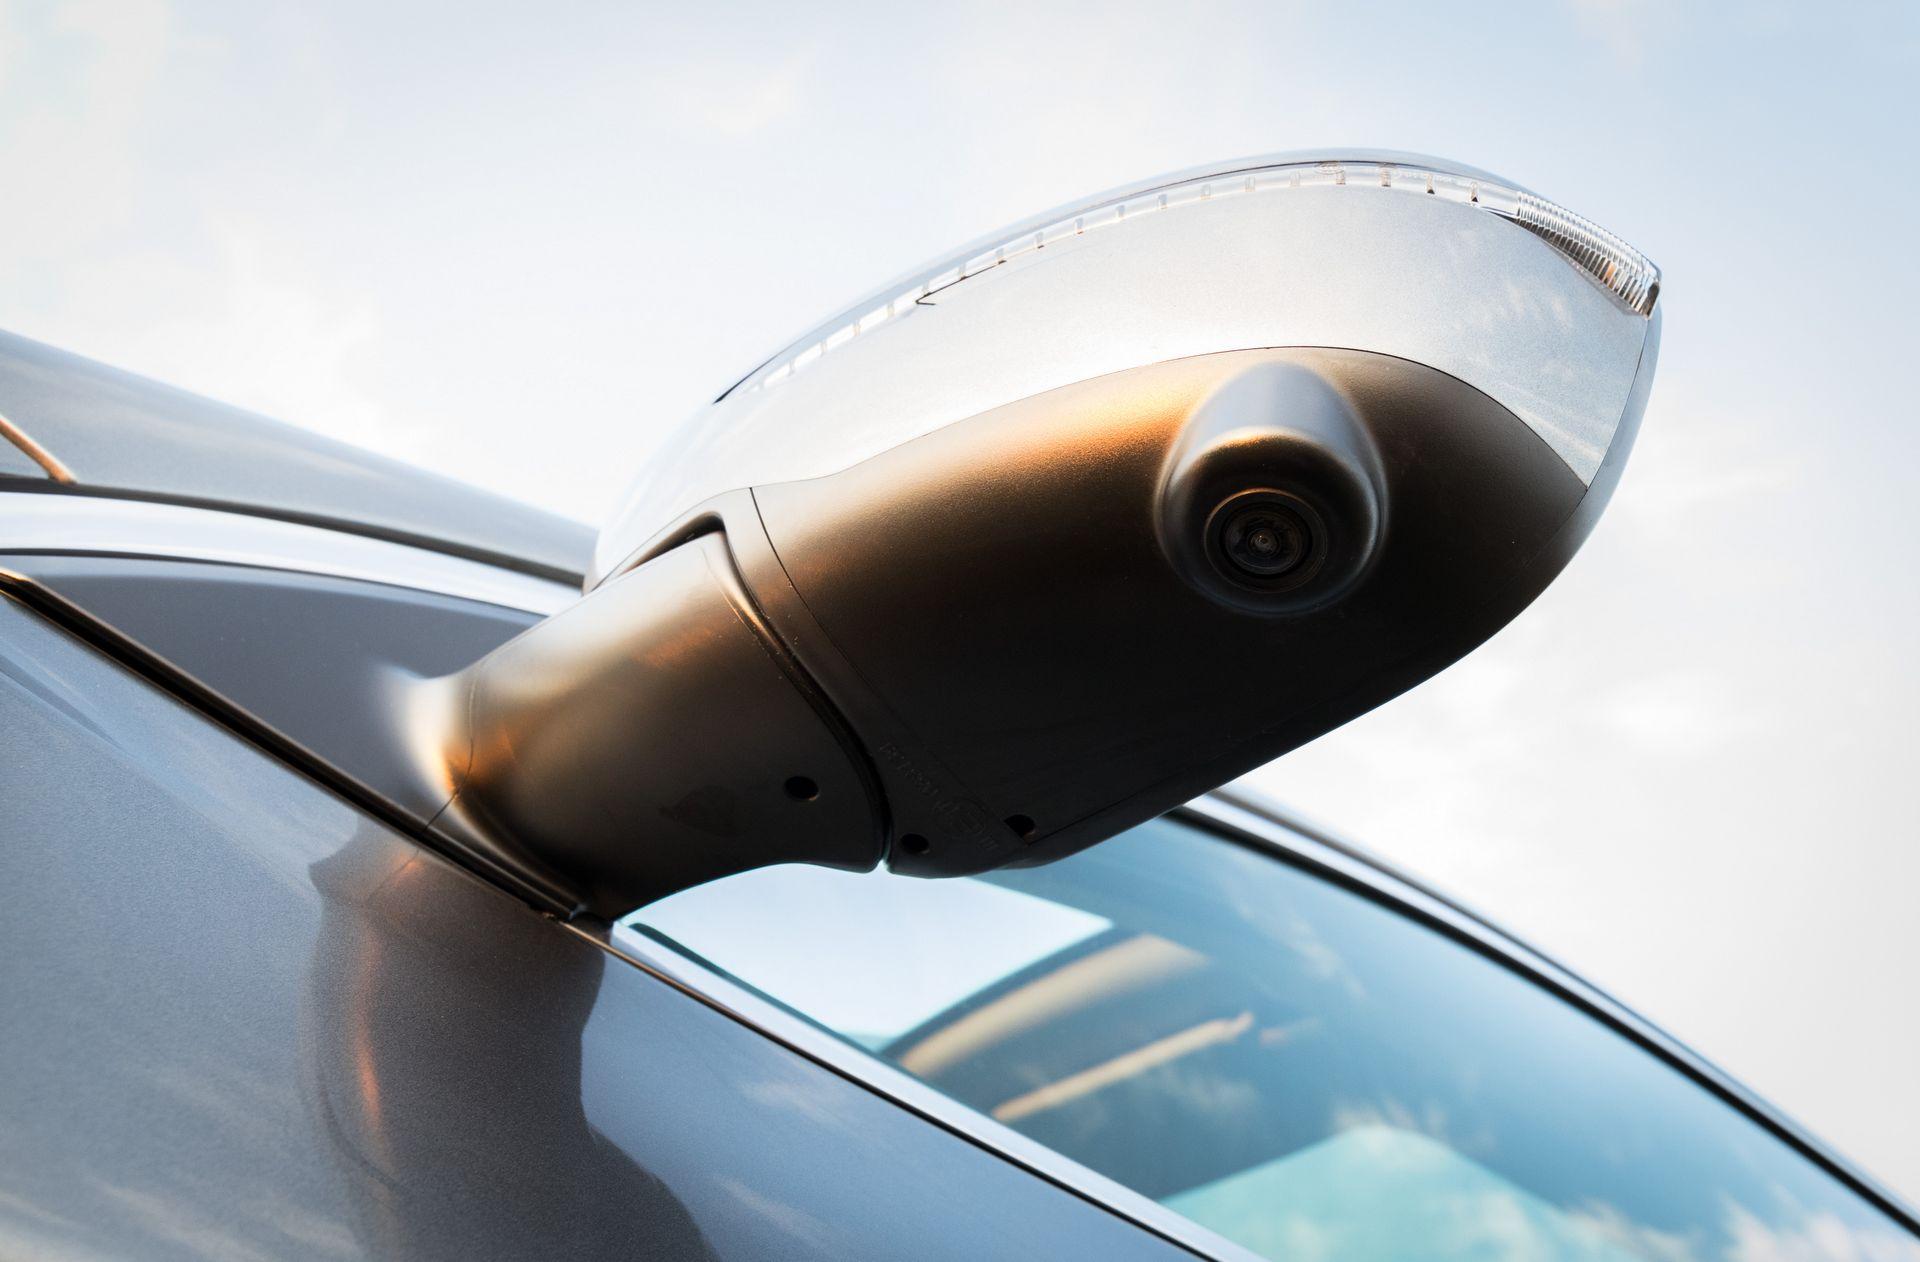 Jedna z kamer systemu 360 stopni